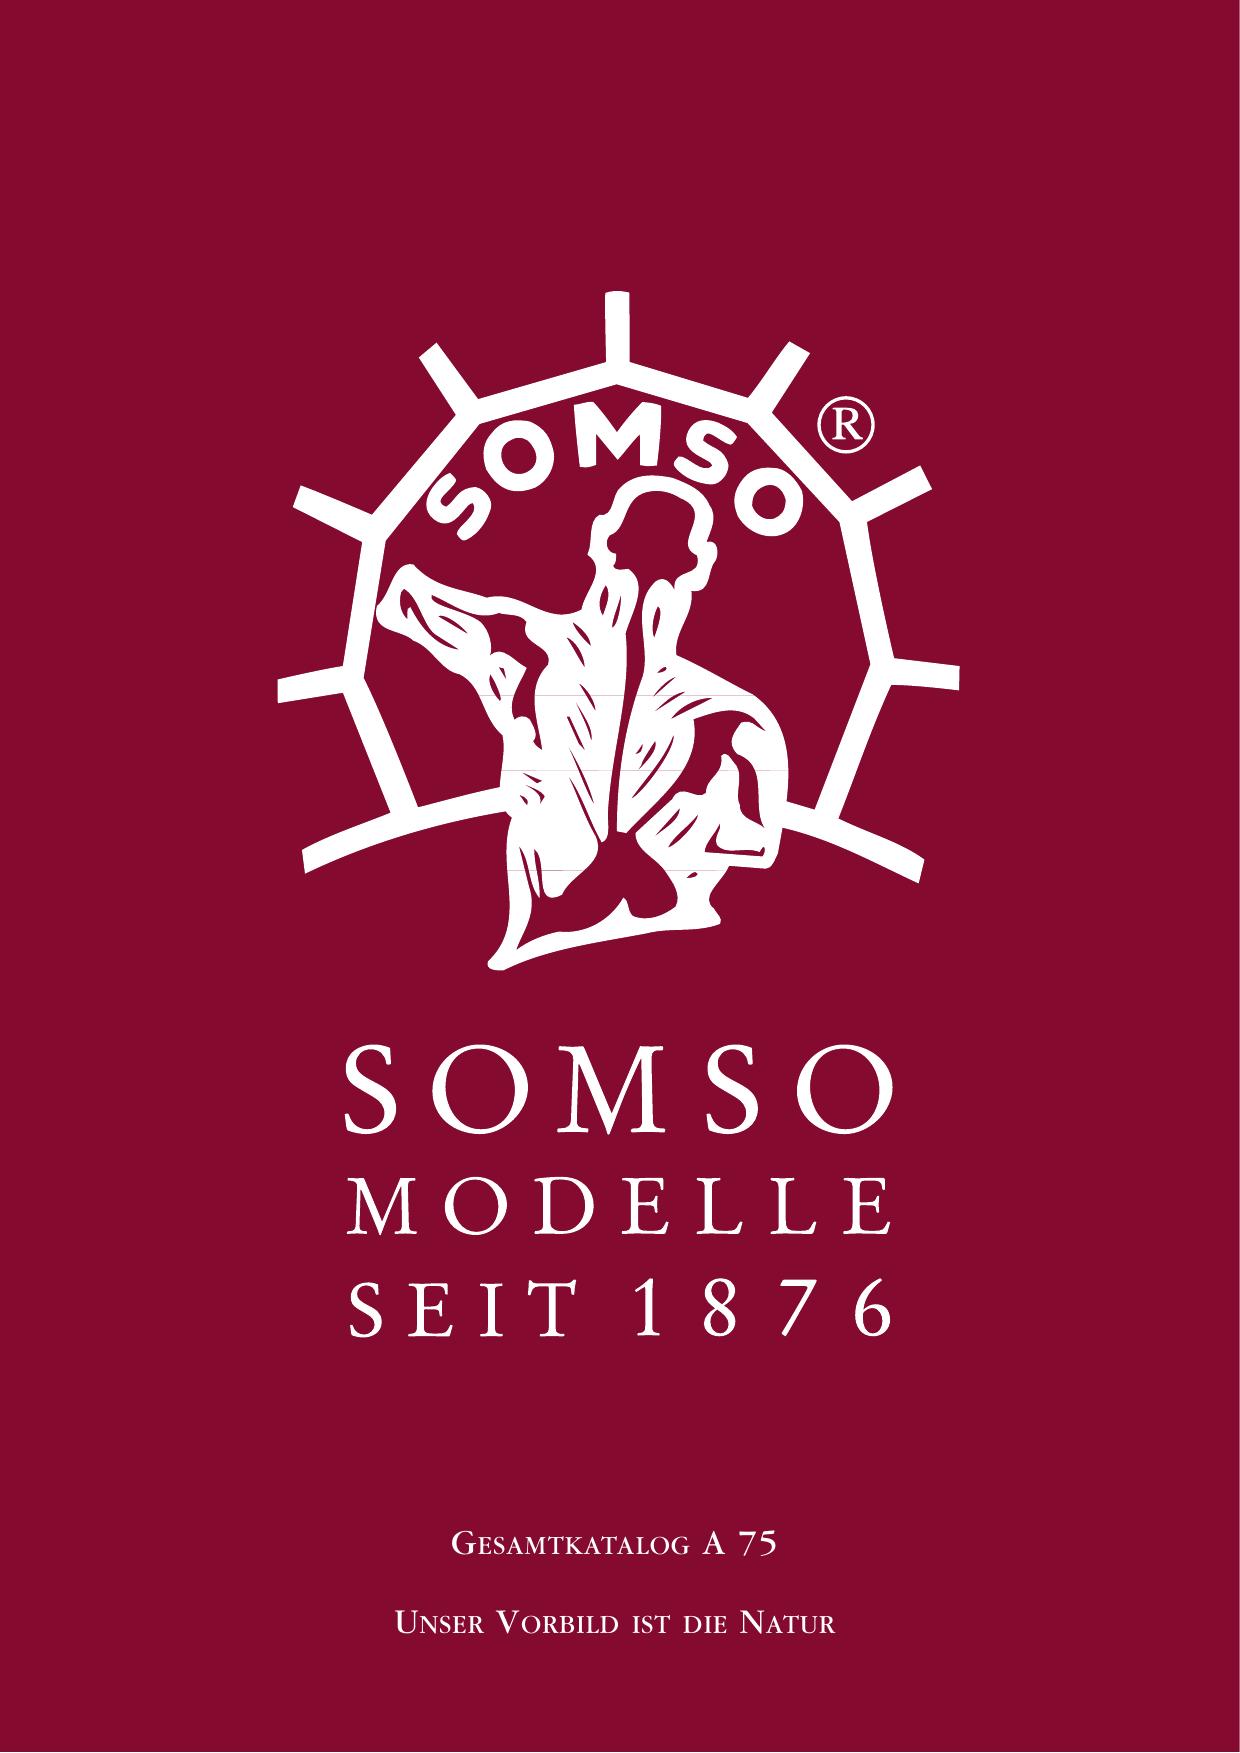 SOMSO Modelle Gesamtkatalog | manualzz.com